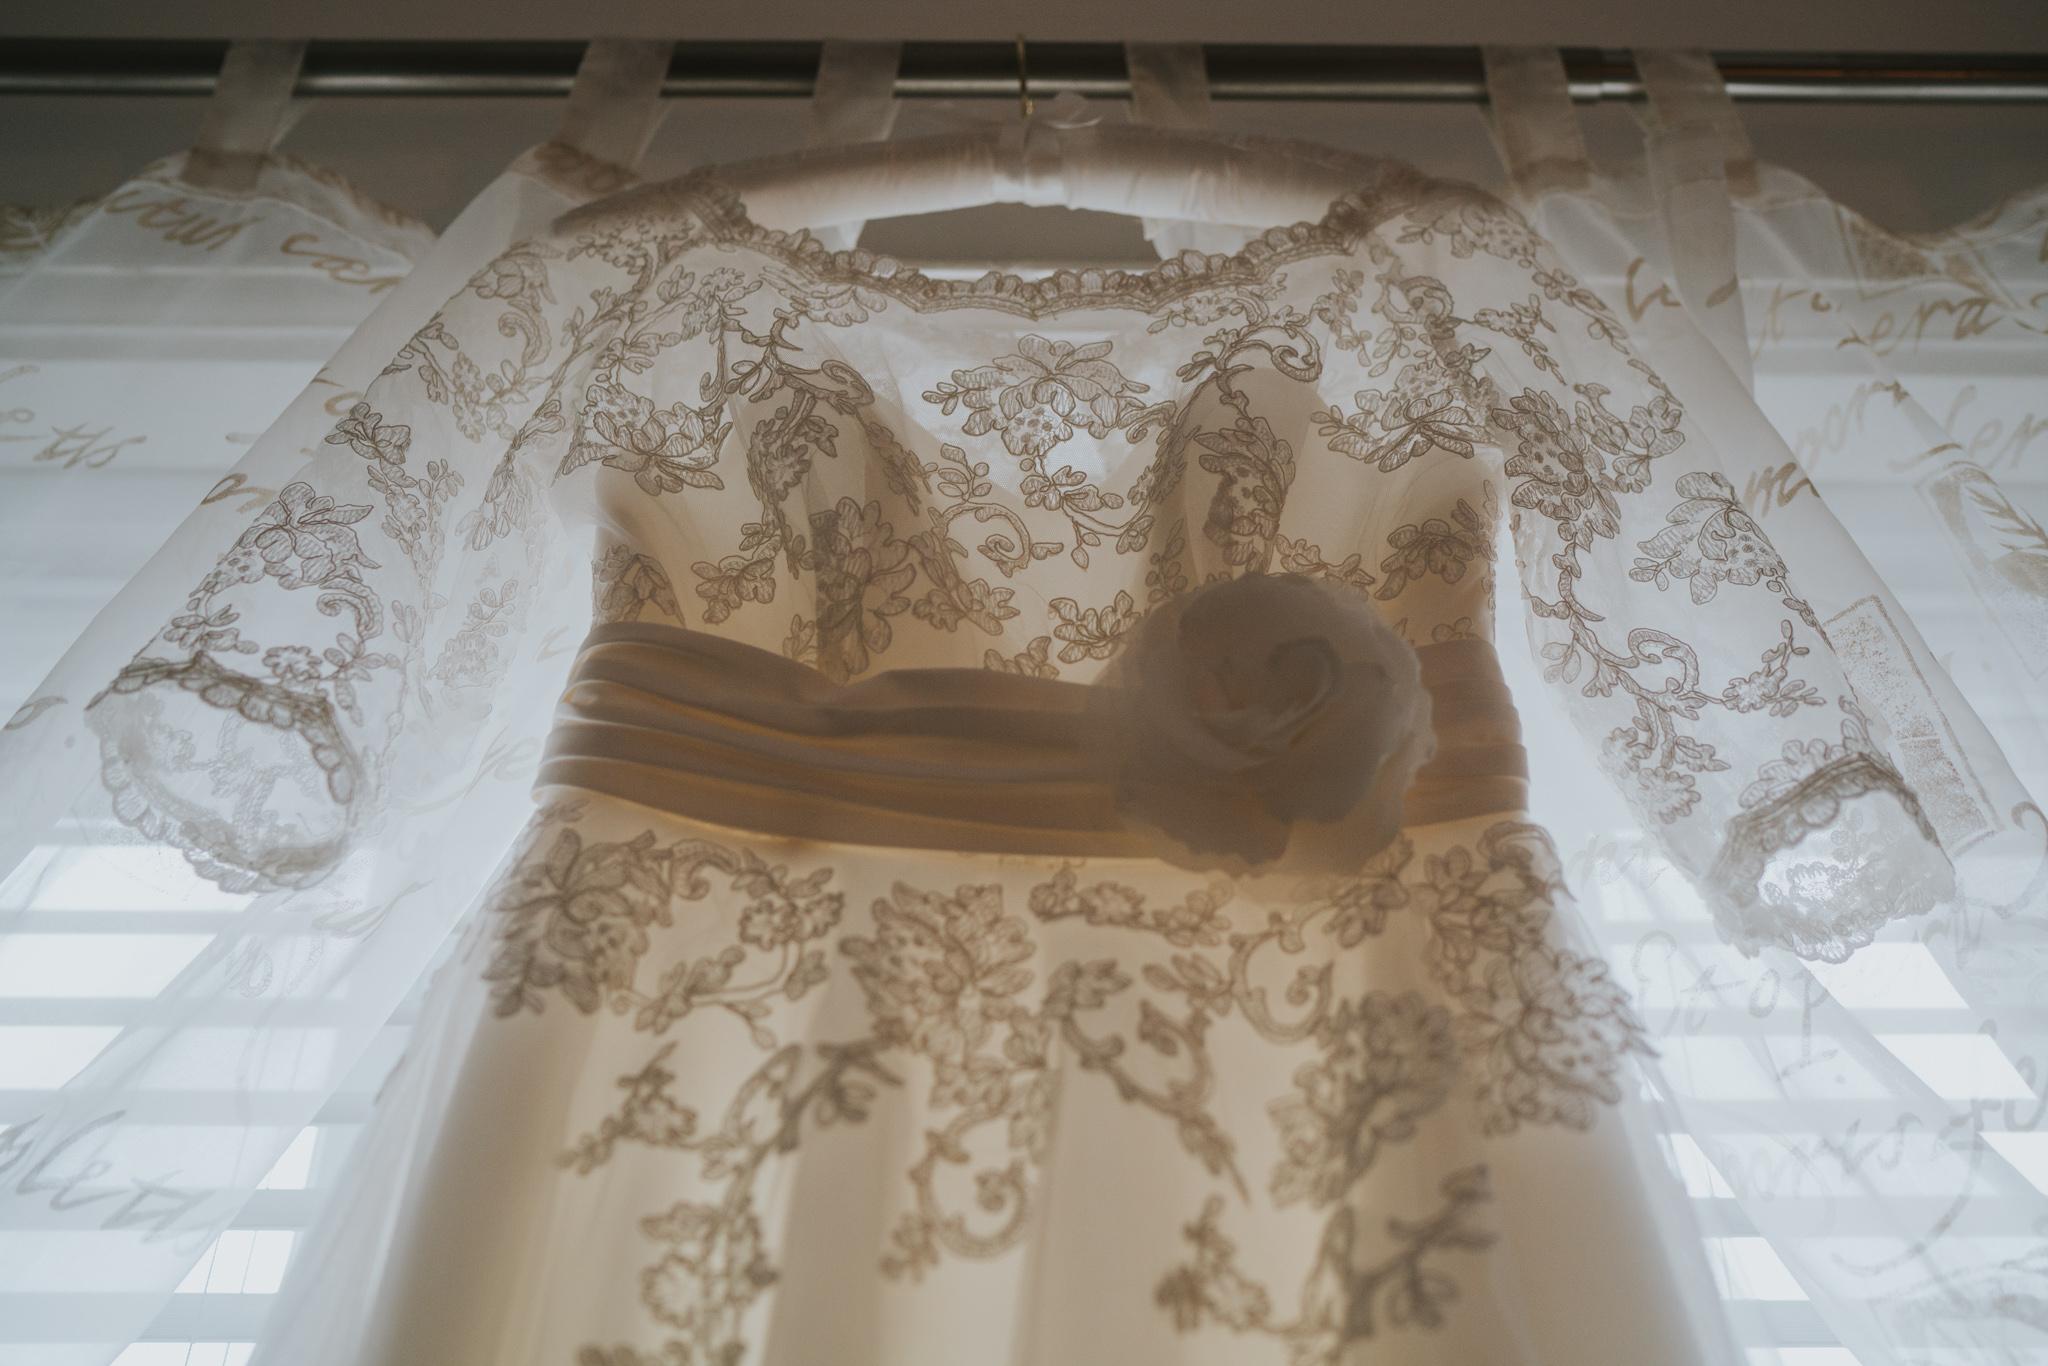 rhia-james-rustic-crabbs-barn-vintage-50s-retro-wedding-grace-elizabeth-colchester-essex-alternative-relaxed-wedding-family-photography-devon-suffolk-norfolk-essex (2 of 138).jpg